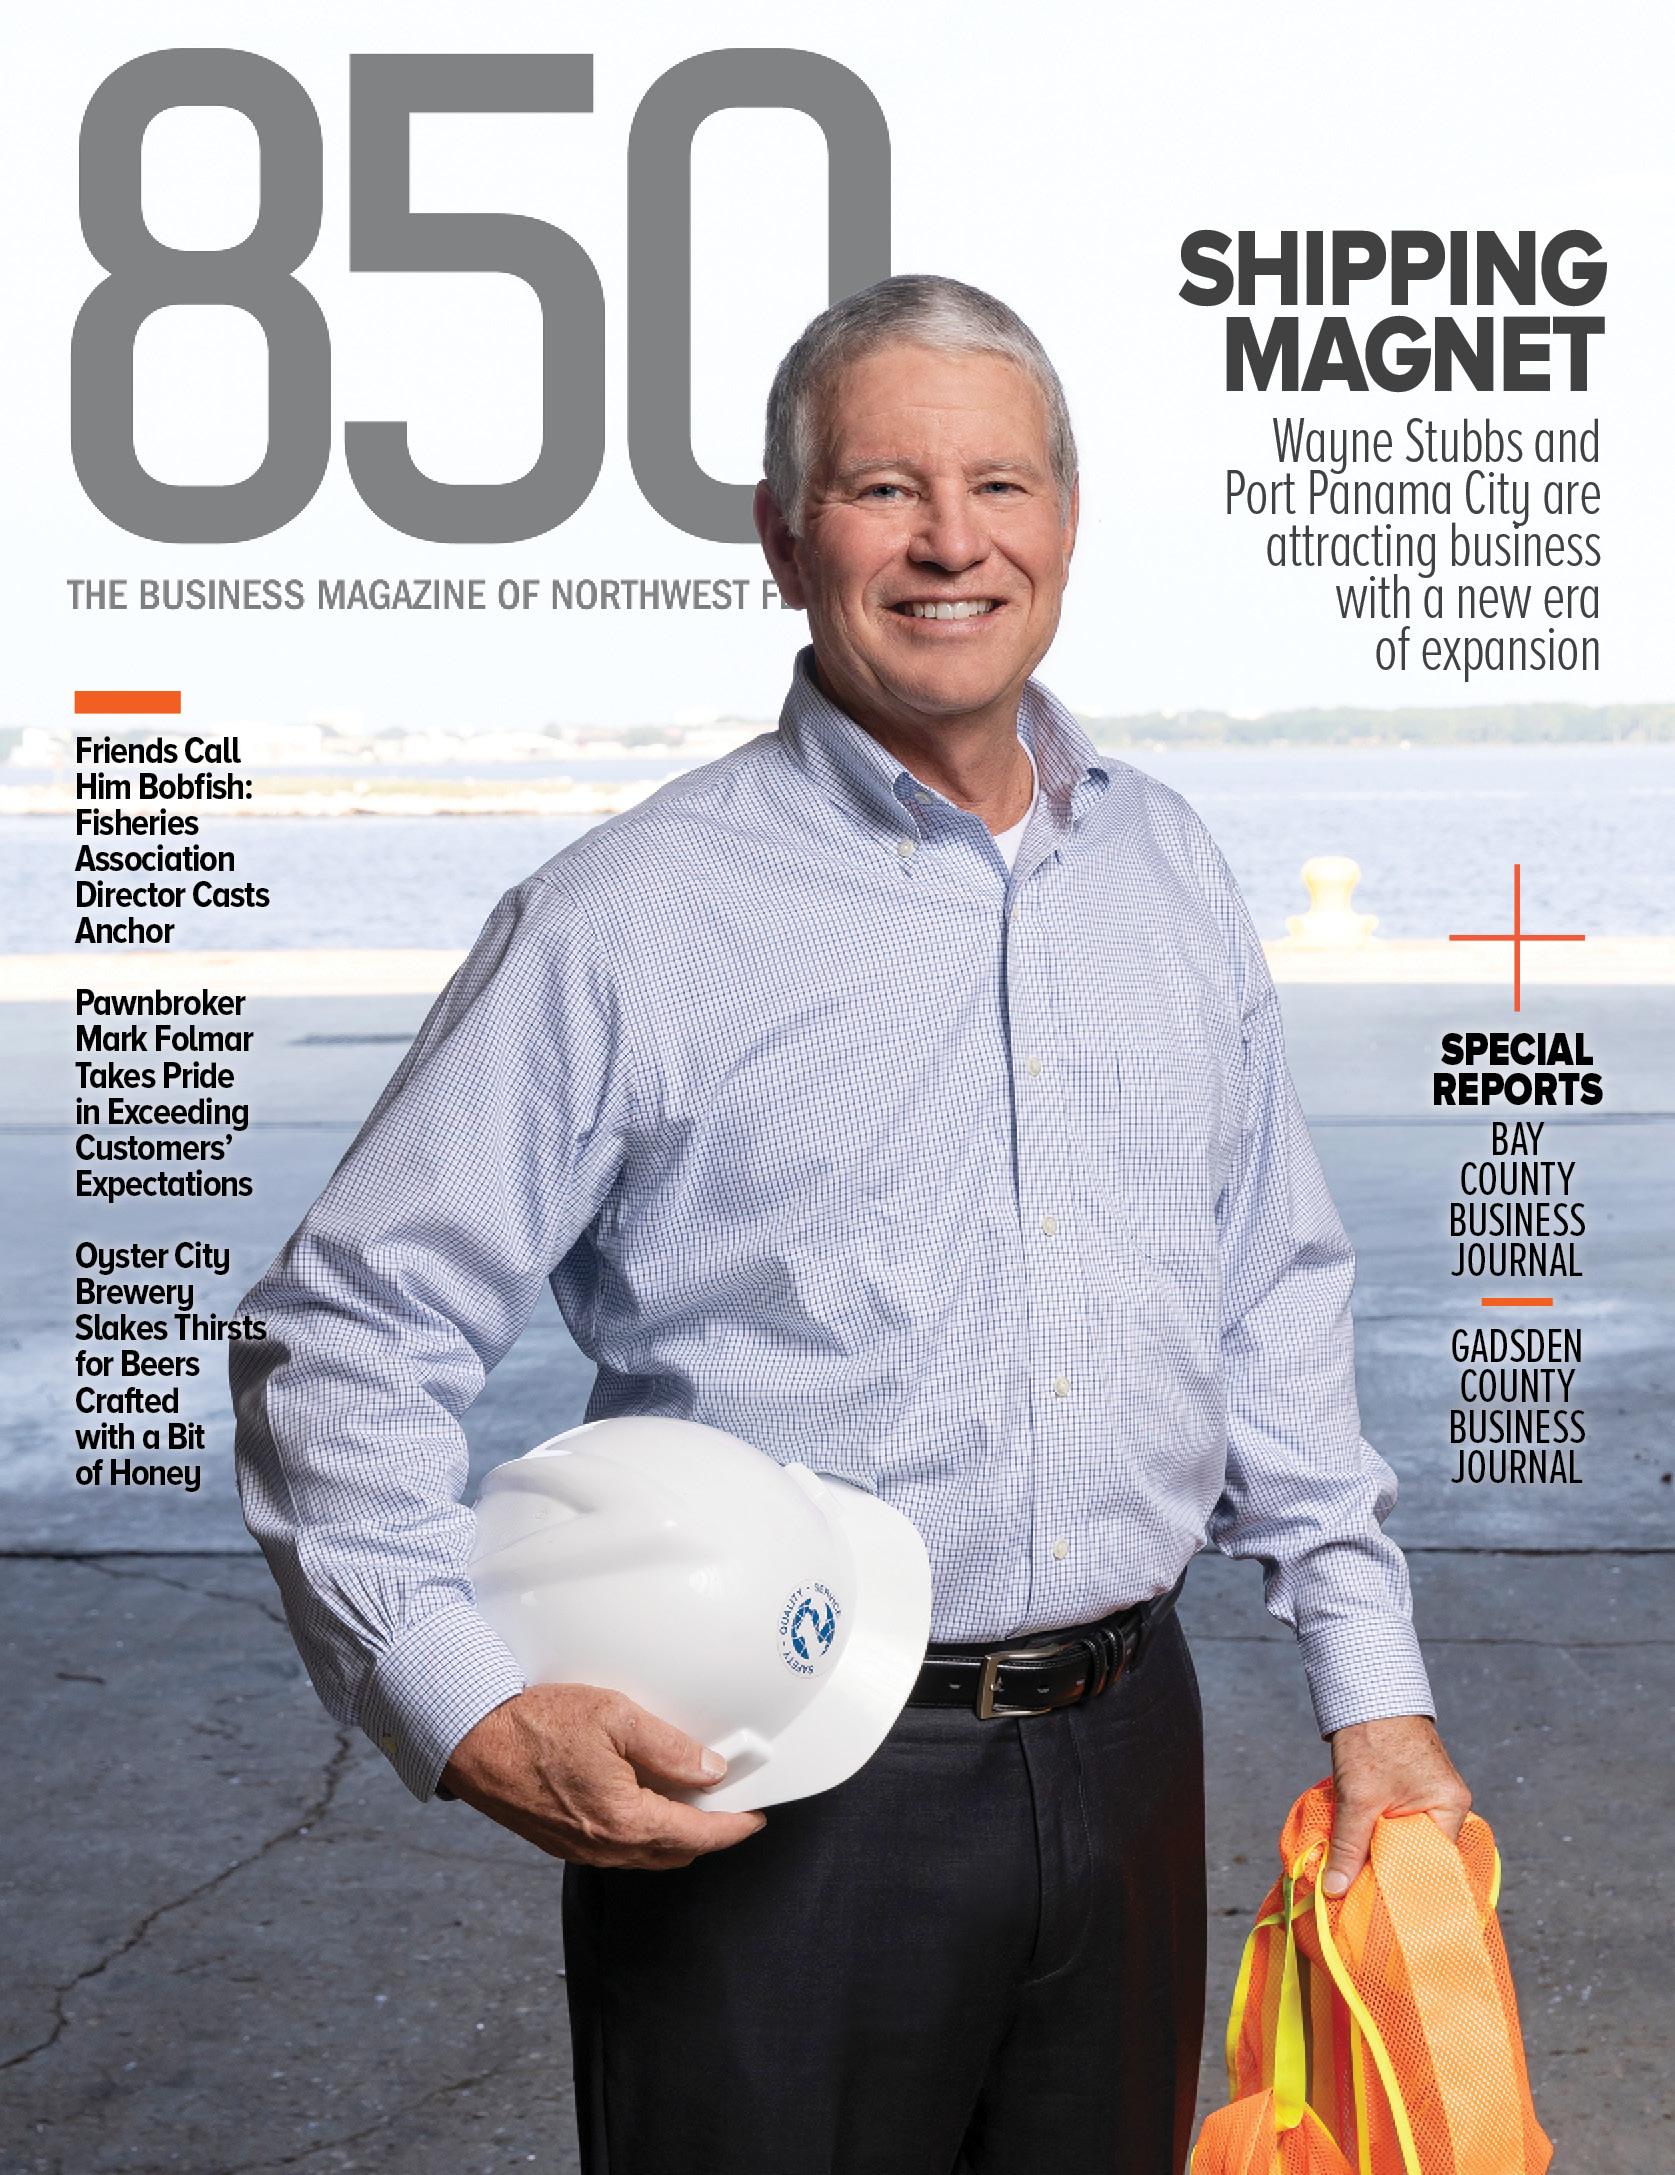 850 Business Magazine